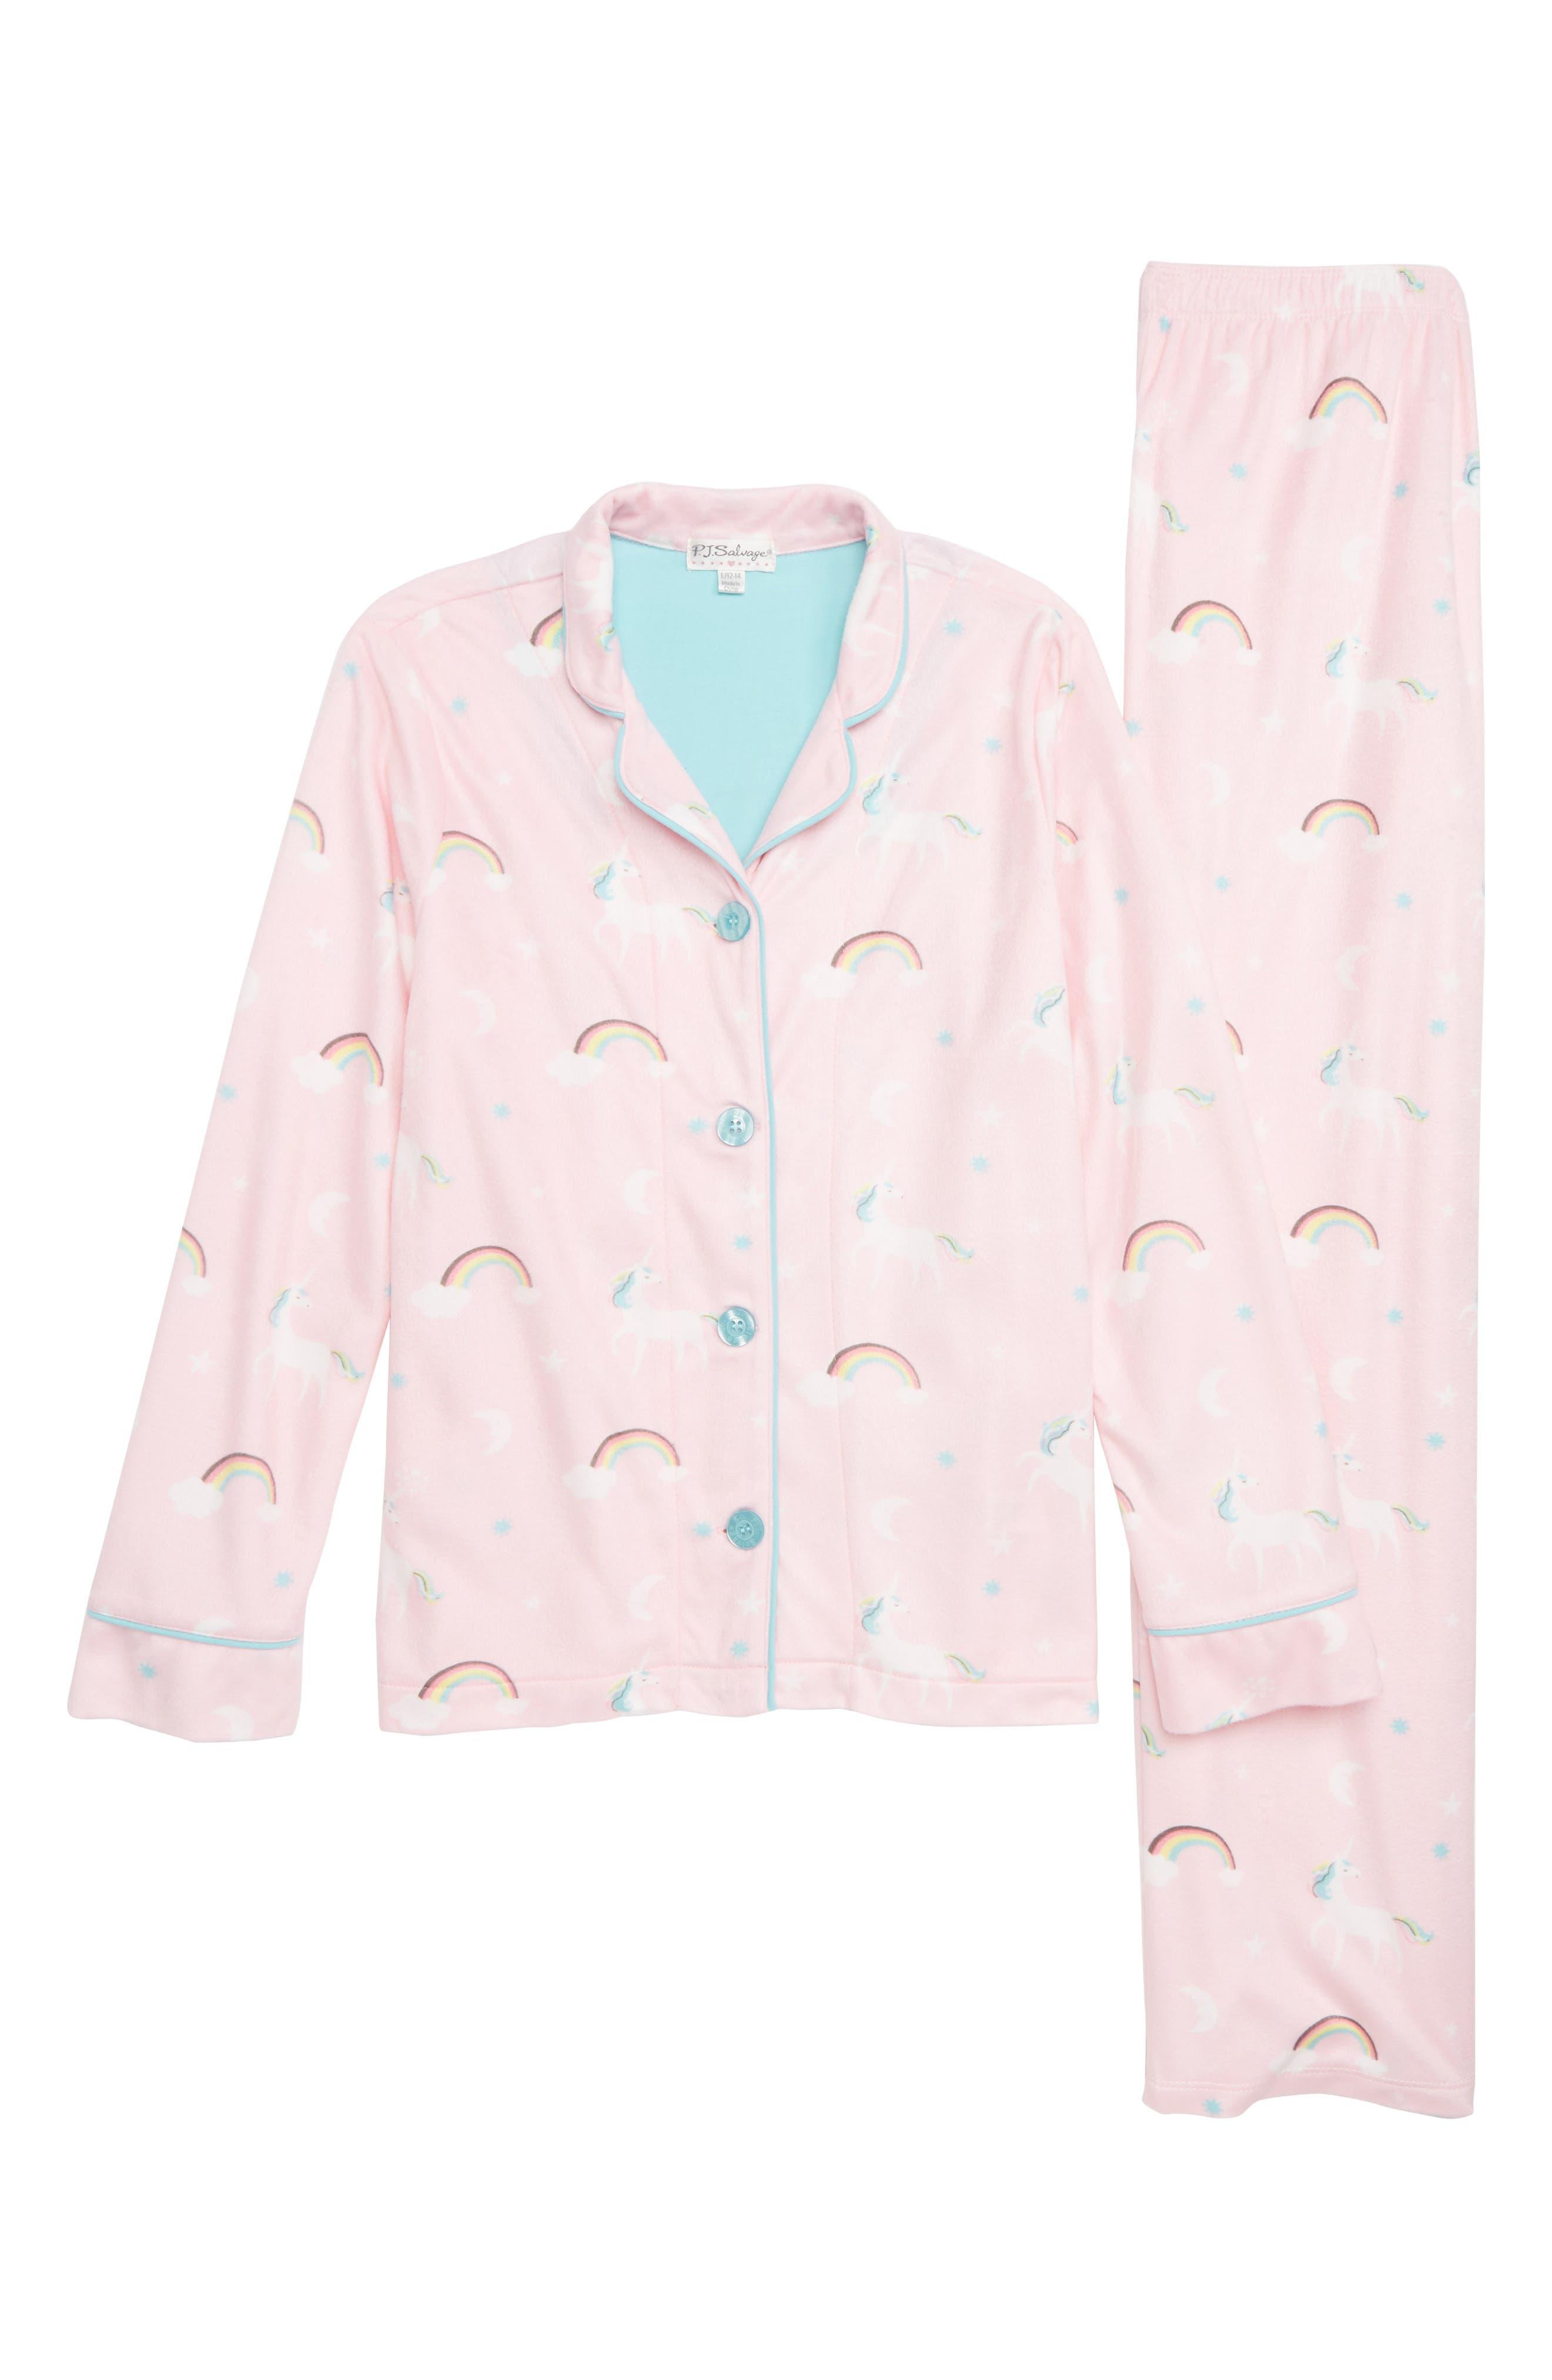 One of a Kind Pajamas,                             Main thumbnail 1, color,                             PINK